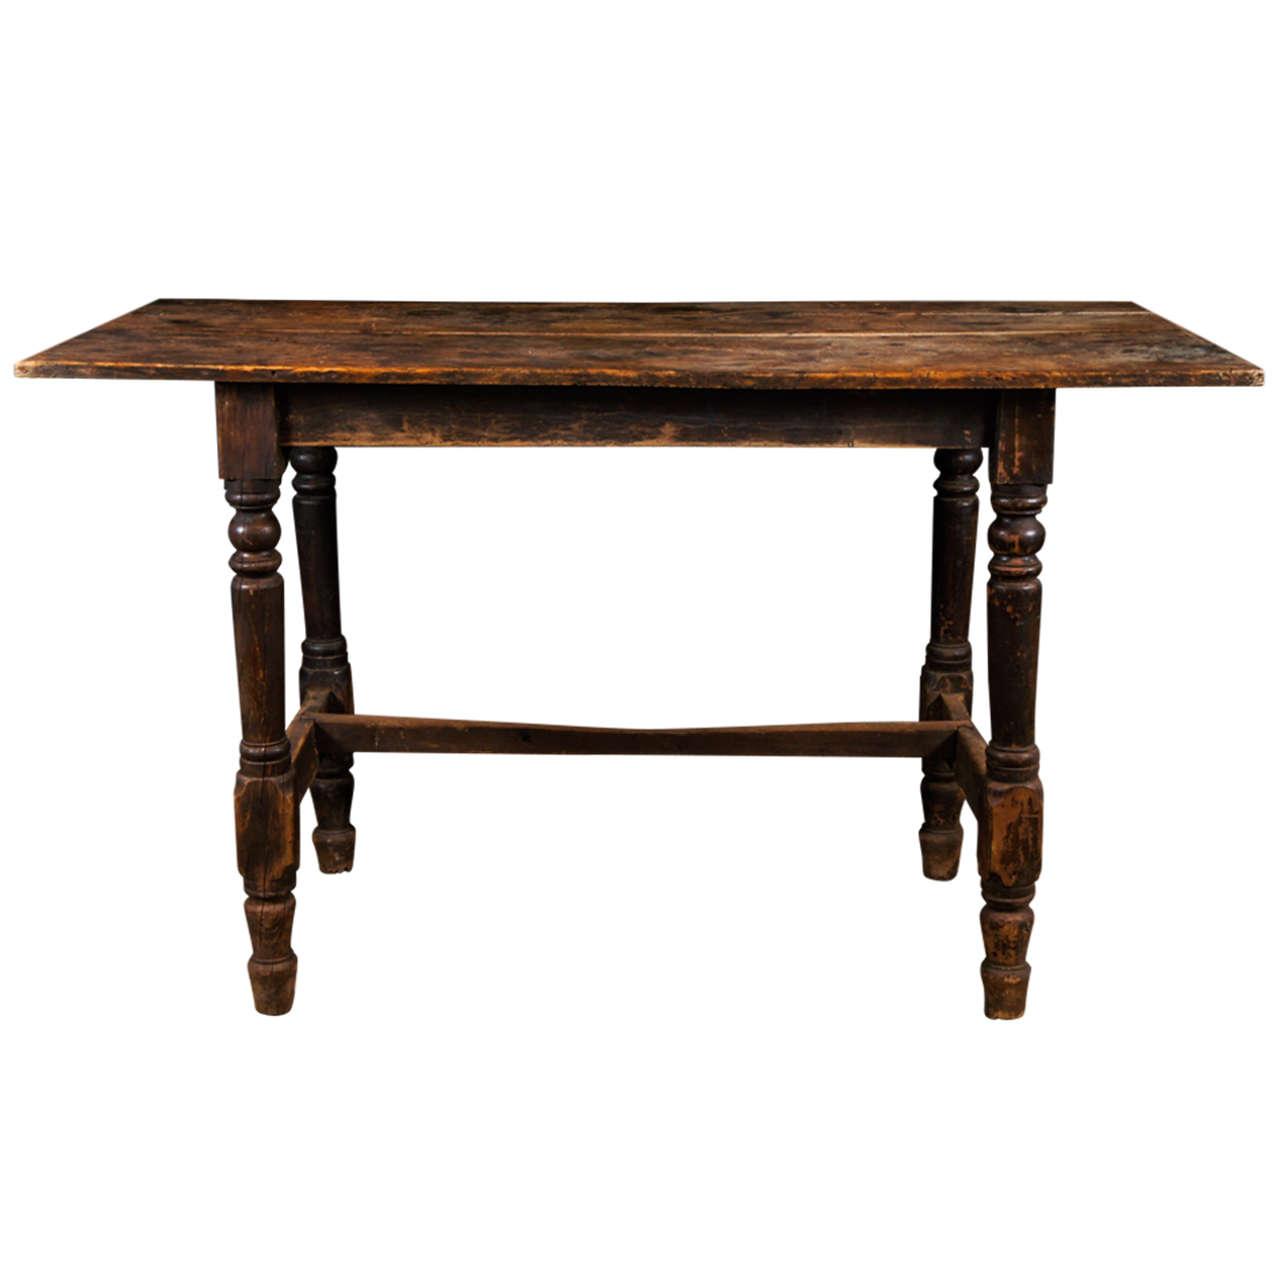 Tall Work Table at 1stdibs : X from 1stdibs.com size 1280 x 1280 jpeg 60kB